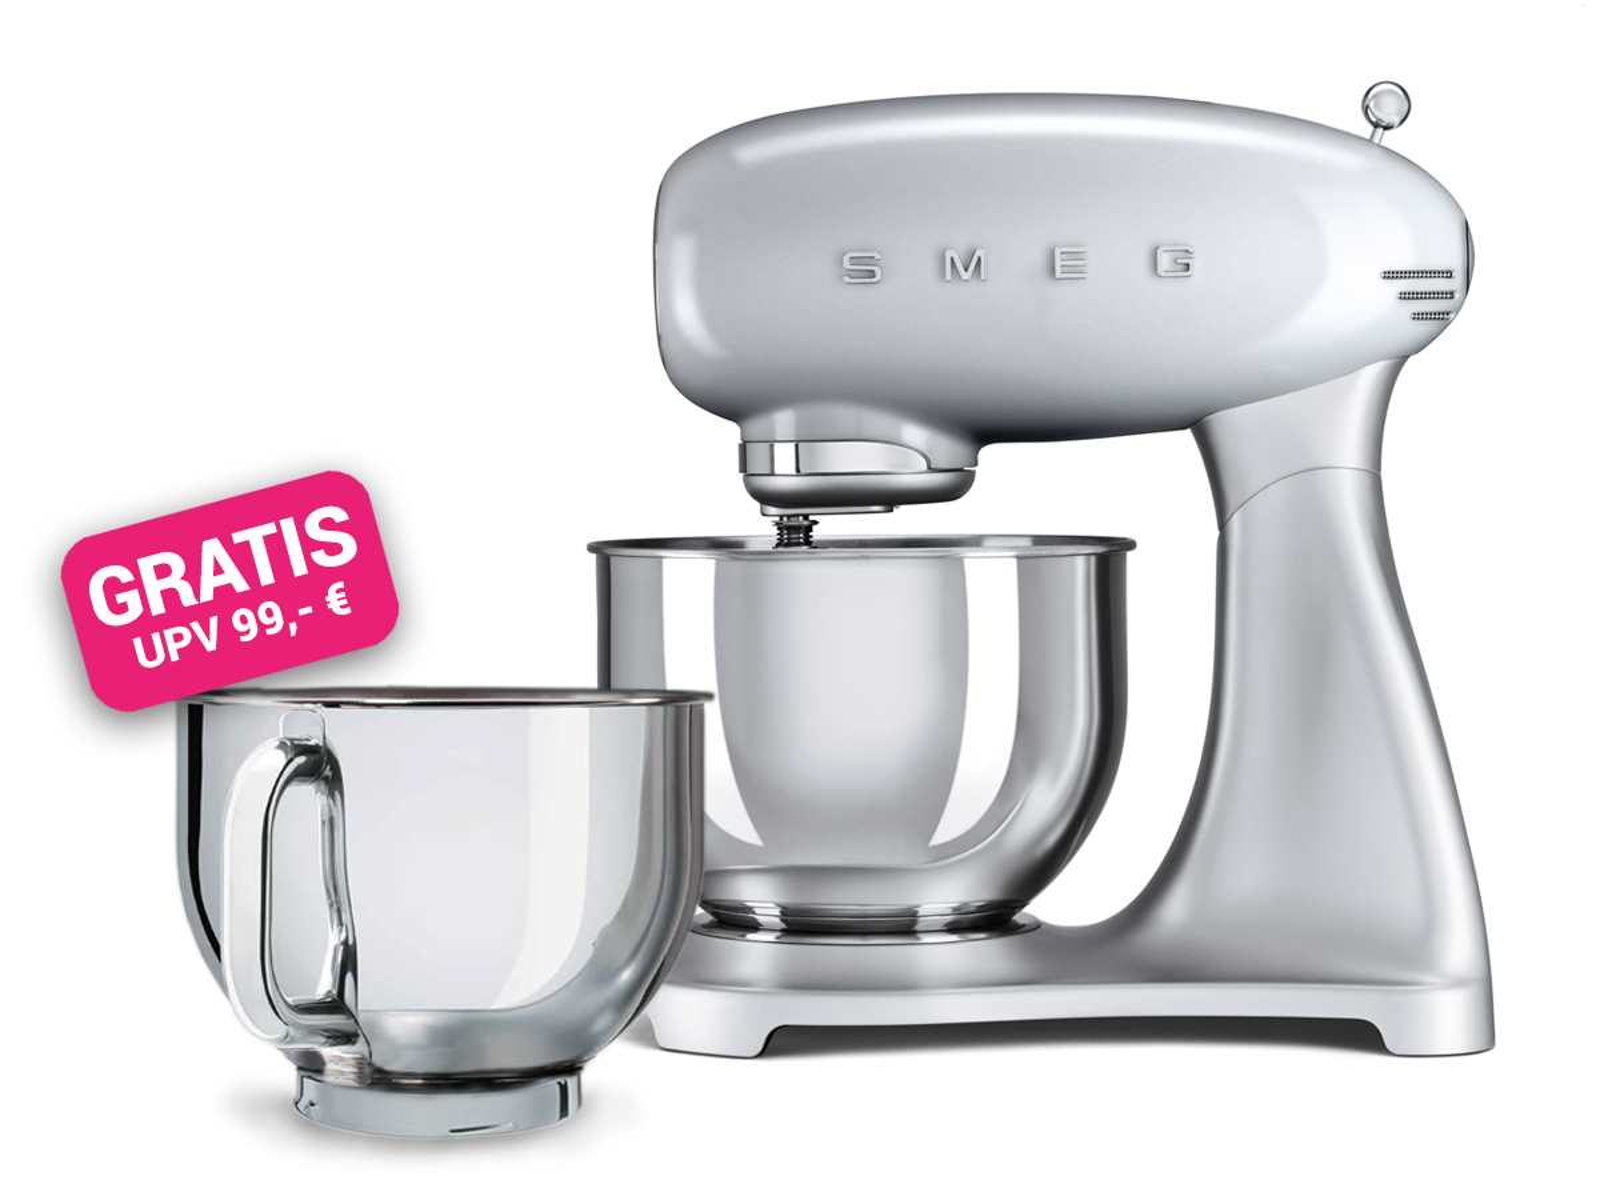 Smeg Kühlschrank Hellgrau : Smeg smf sveu küchenmaschine polarsilber metallic inkl gratis